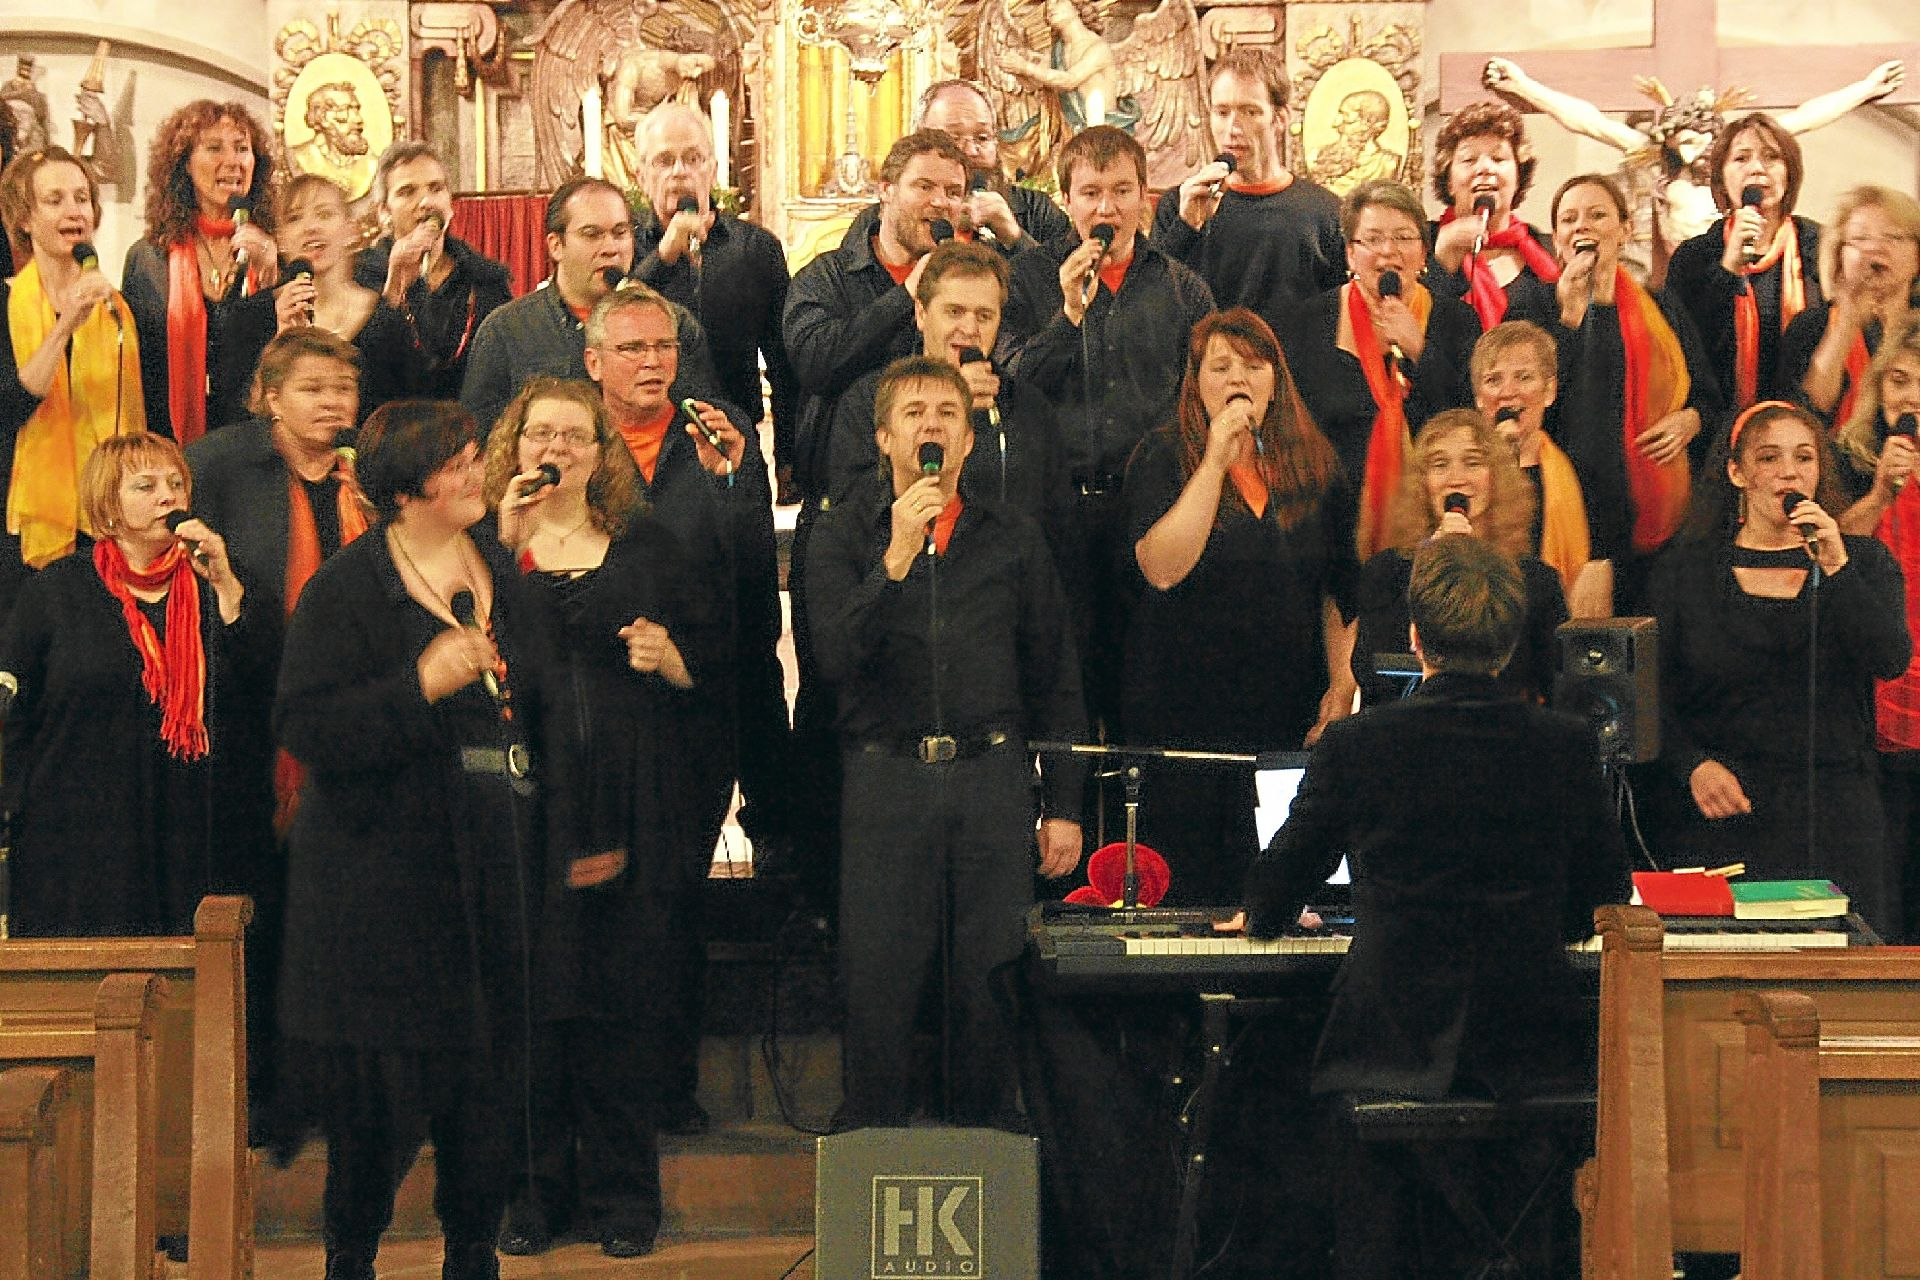 Villingen-Schwenningen: Gospelchor verbreitet frohe